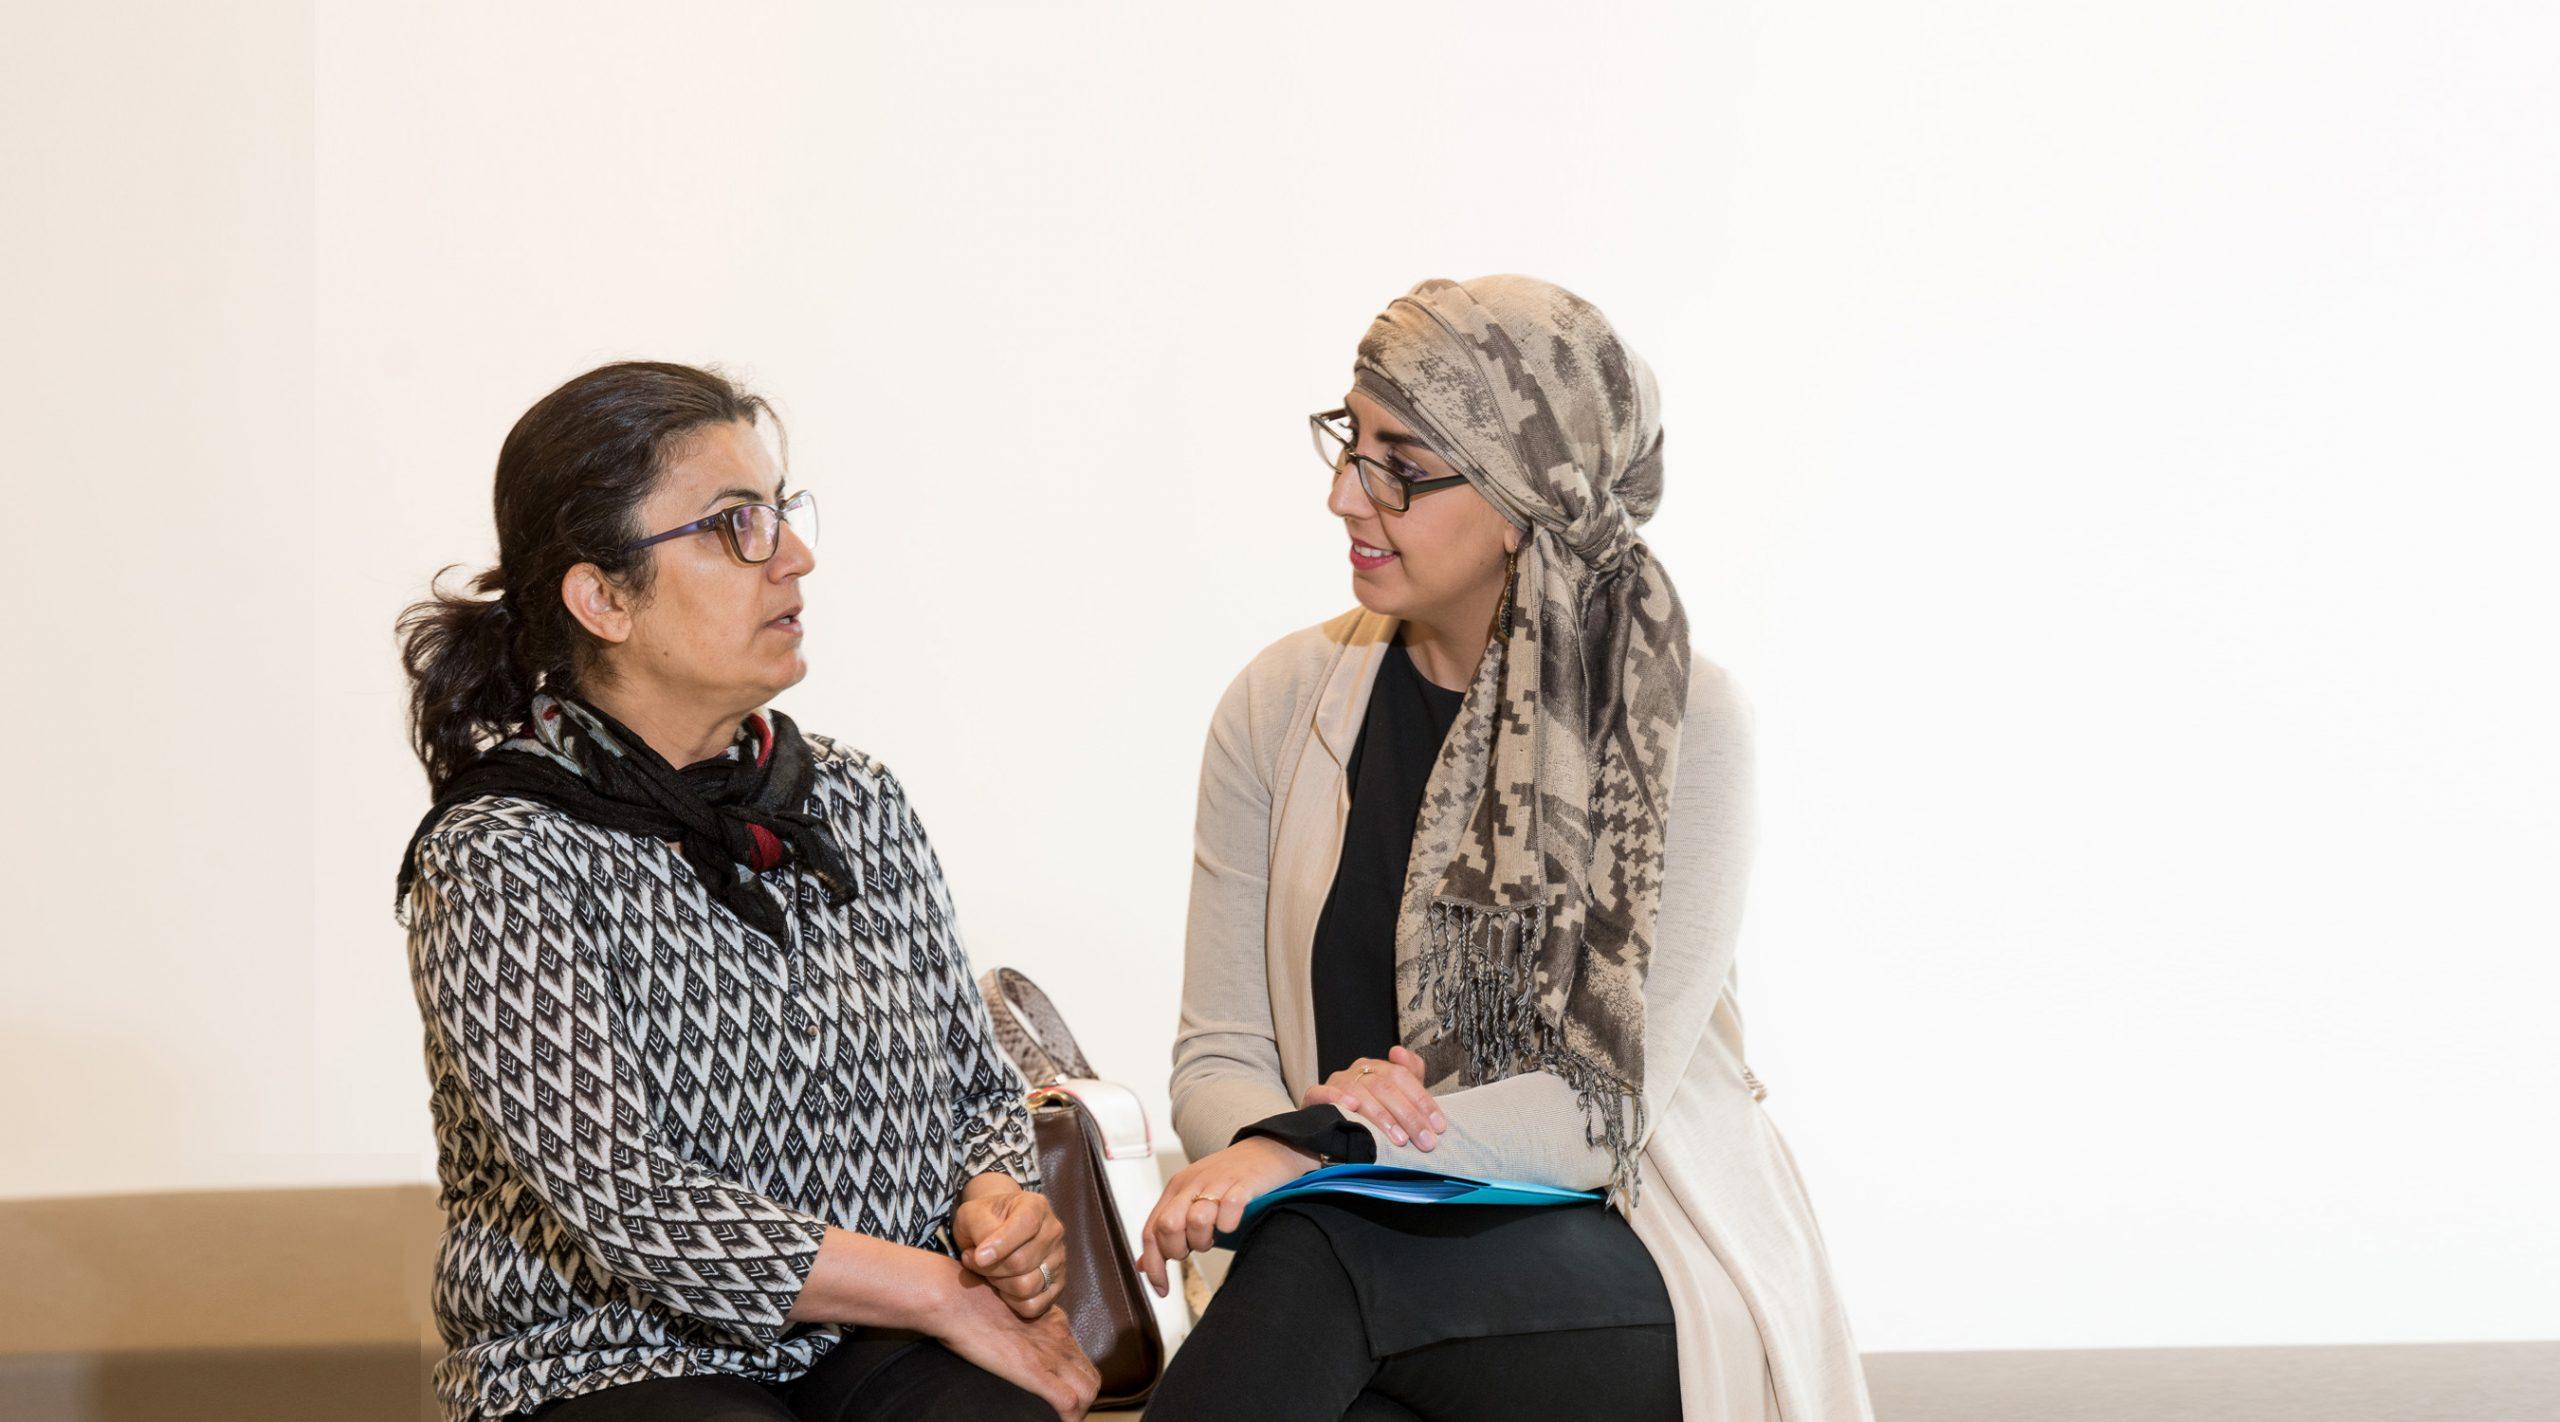 consulente en cliënt in gesprek